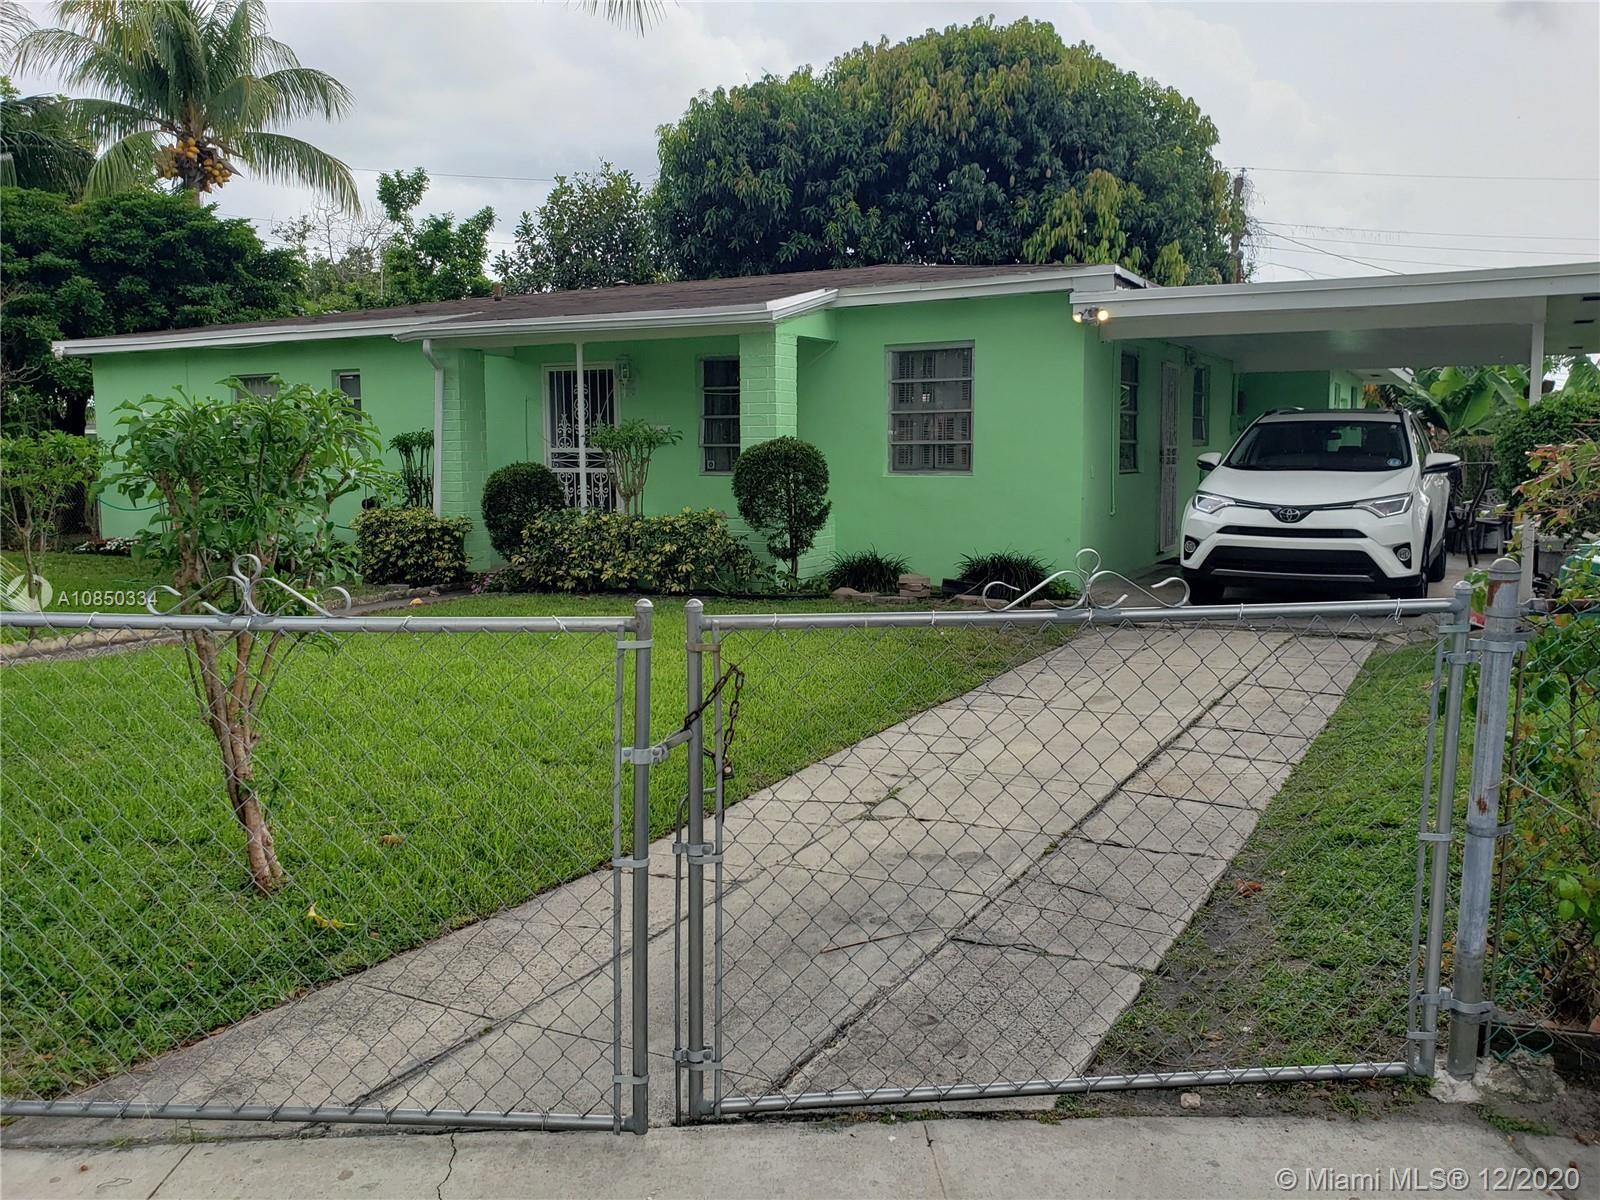 530 NW 194th St, Miami Gardens, FL 33169 - #: A10850334